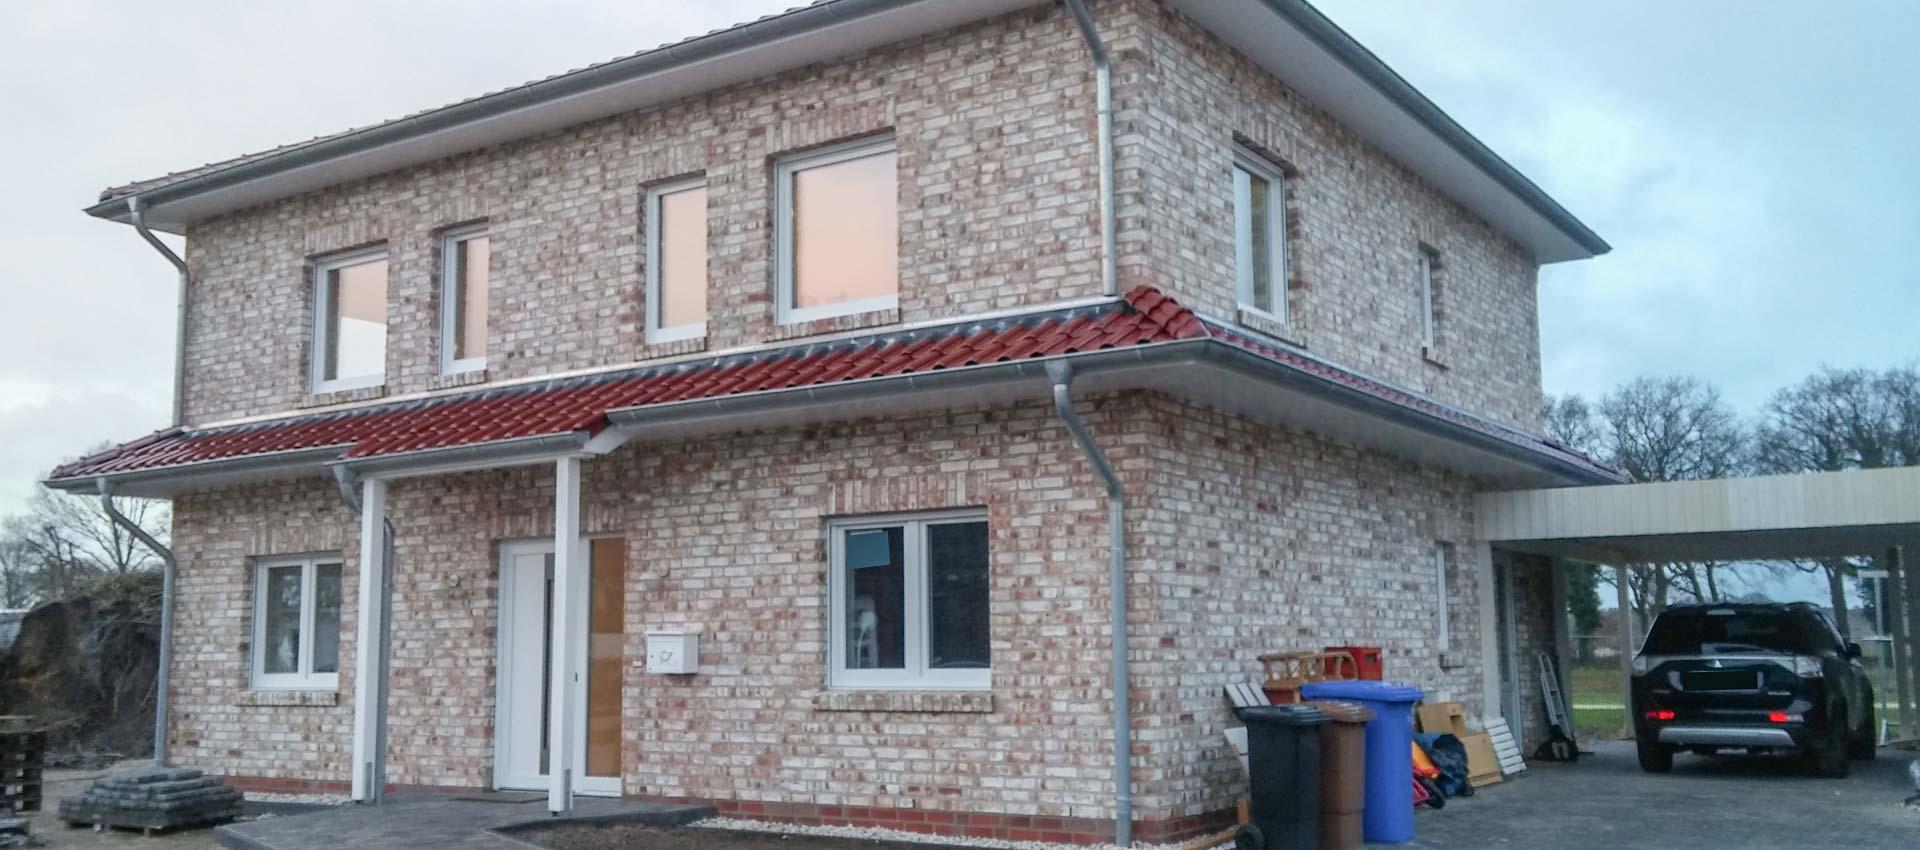 Haus im Bau PN2342